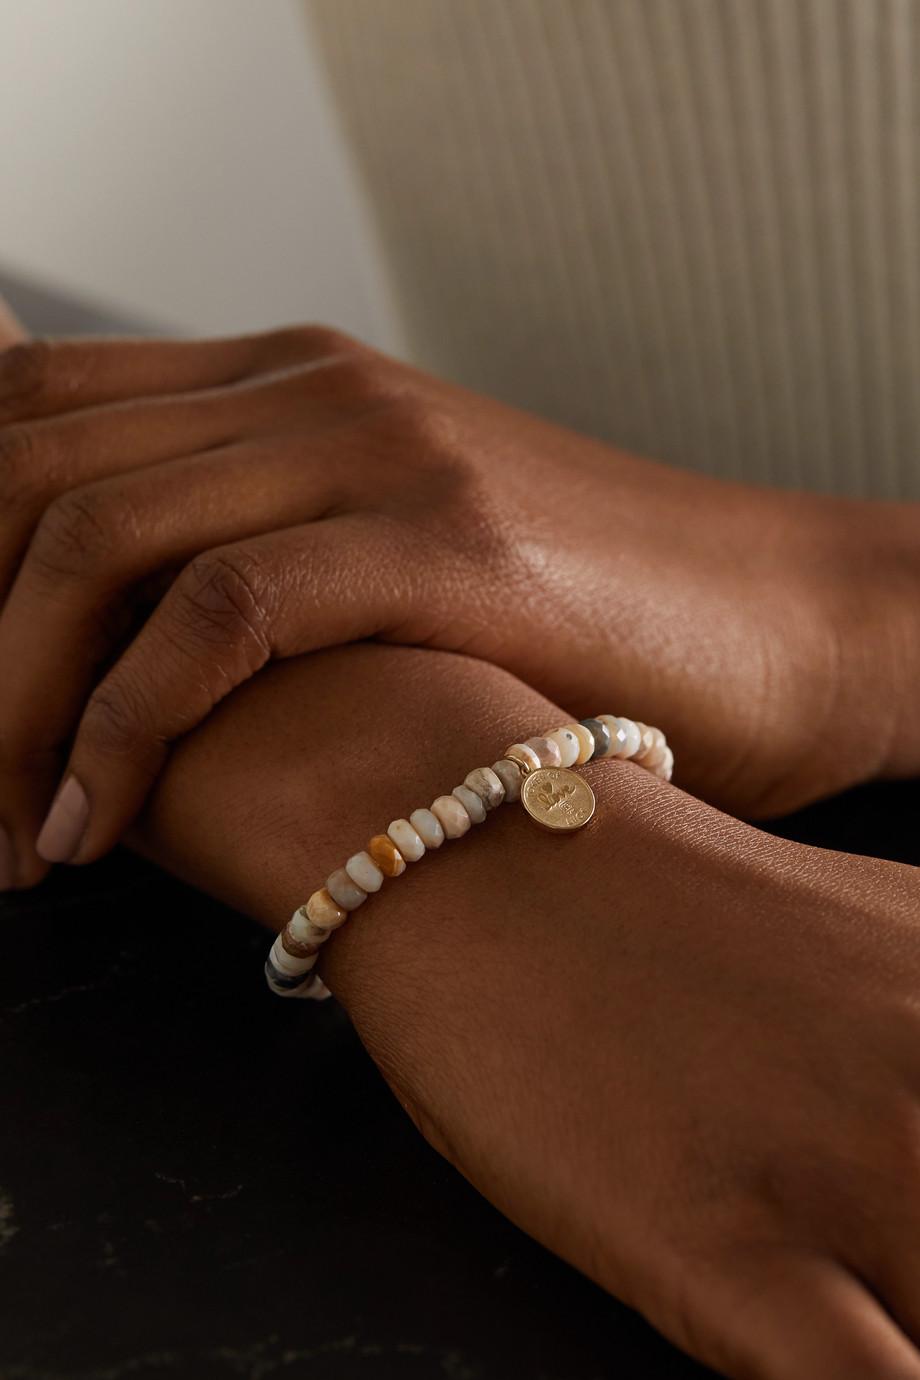 Sydney Evan Tiny Luck and Protection 14-karat gold, moonstone and diamond bracelet